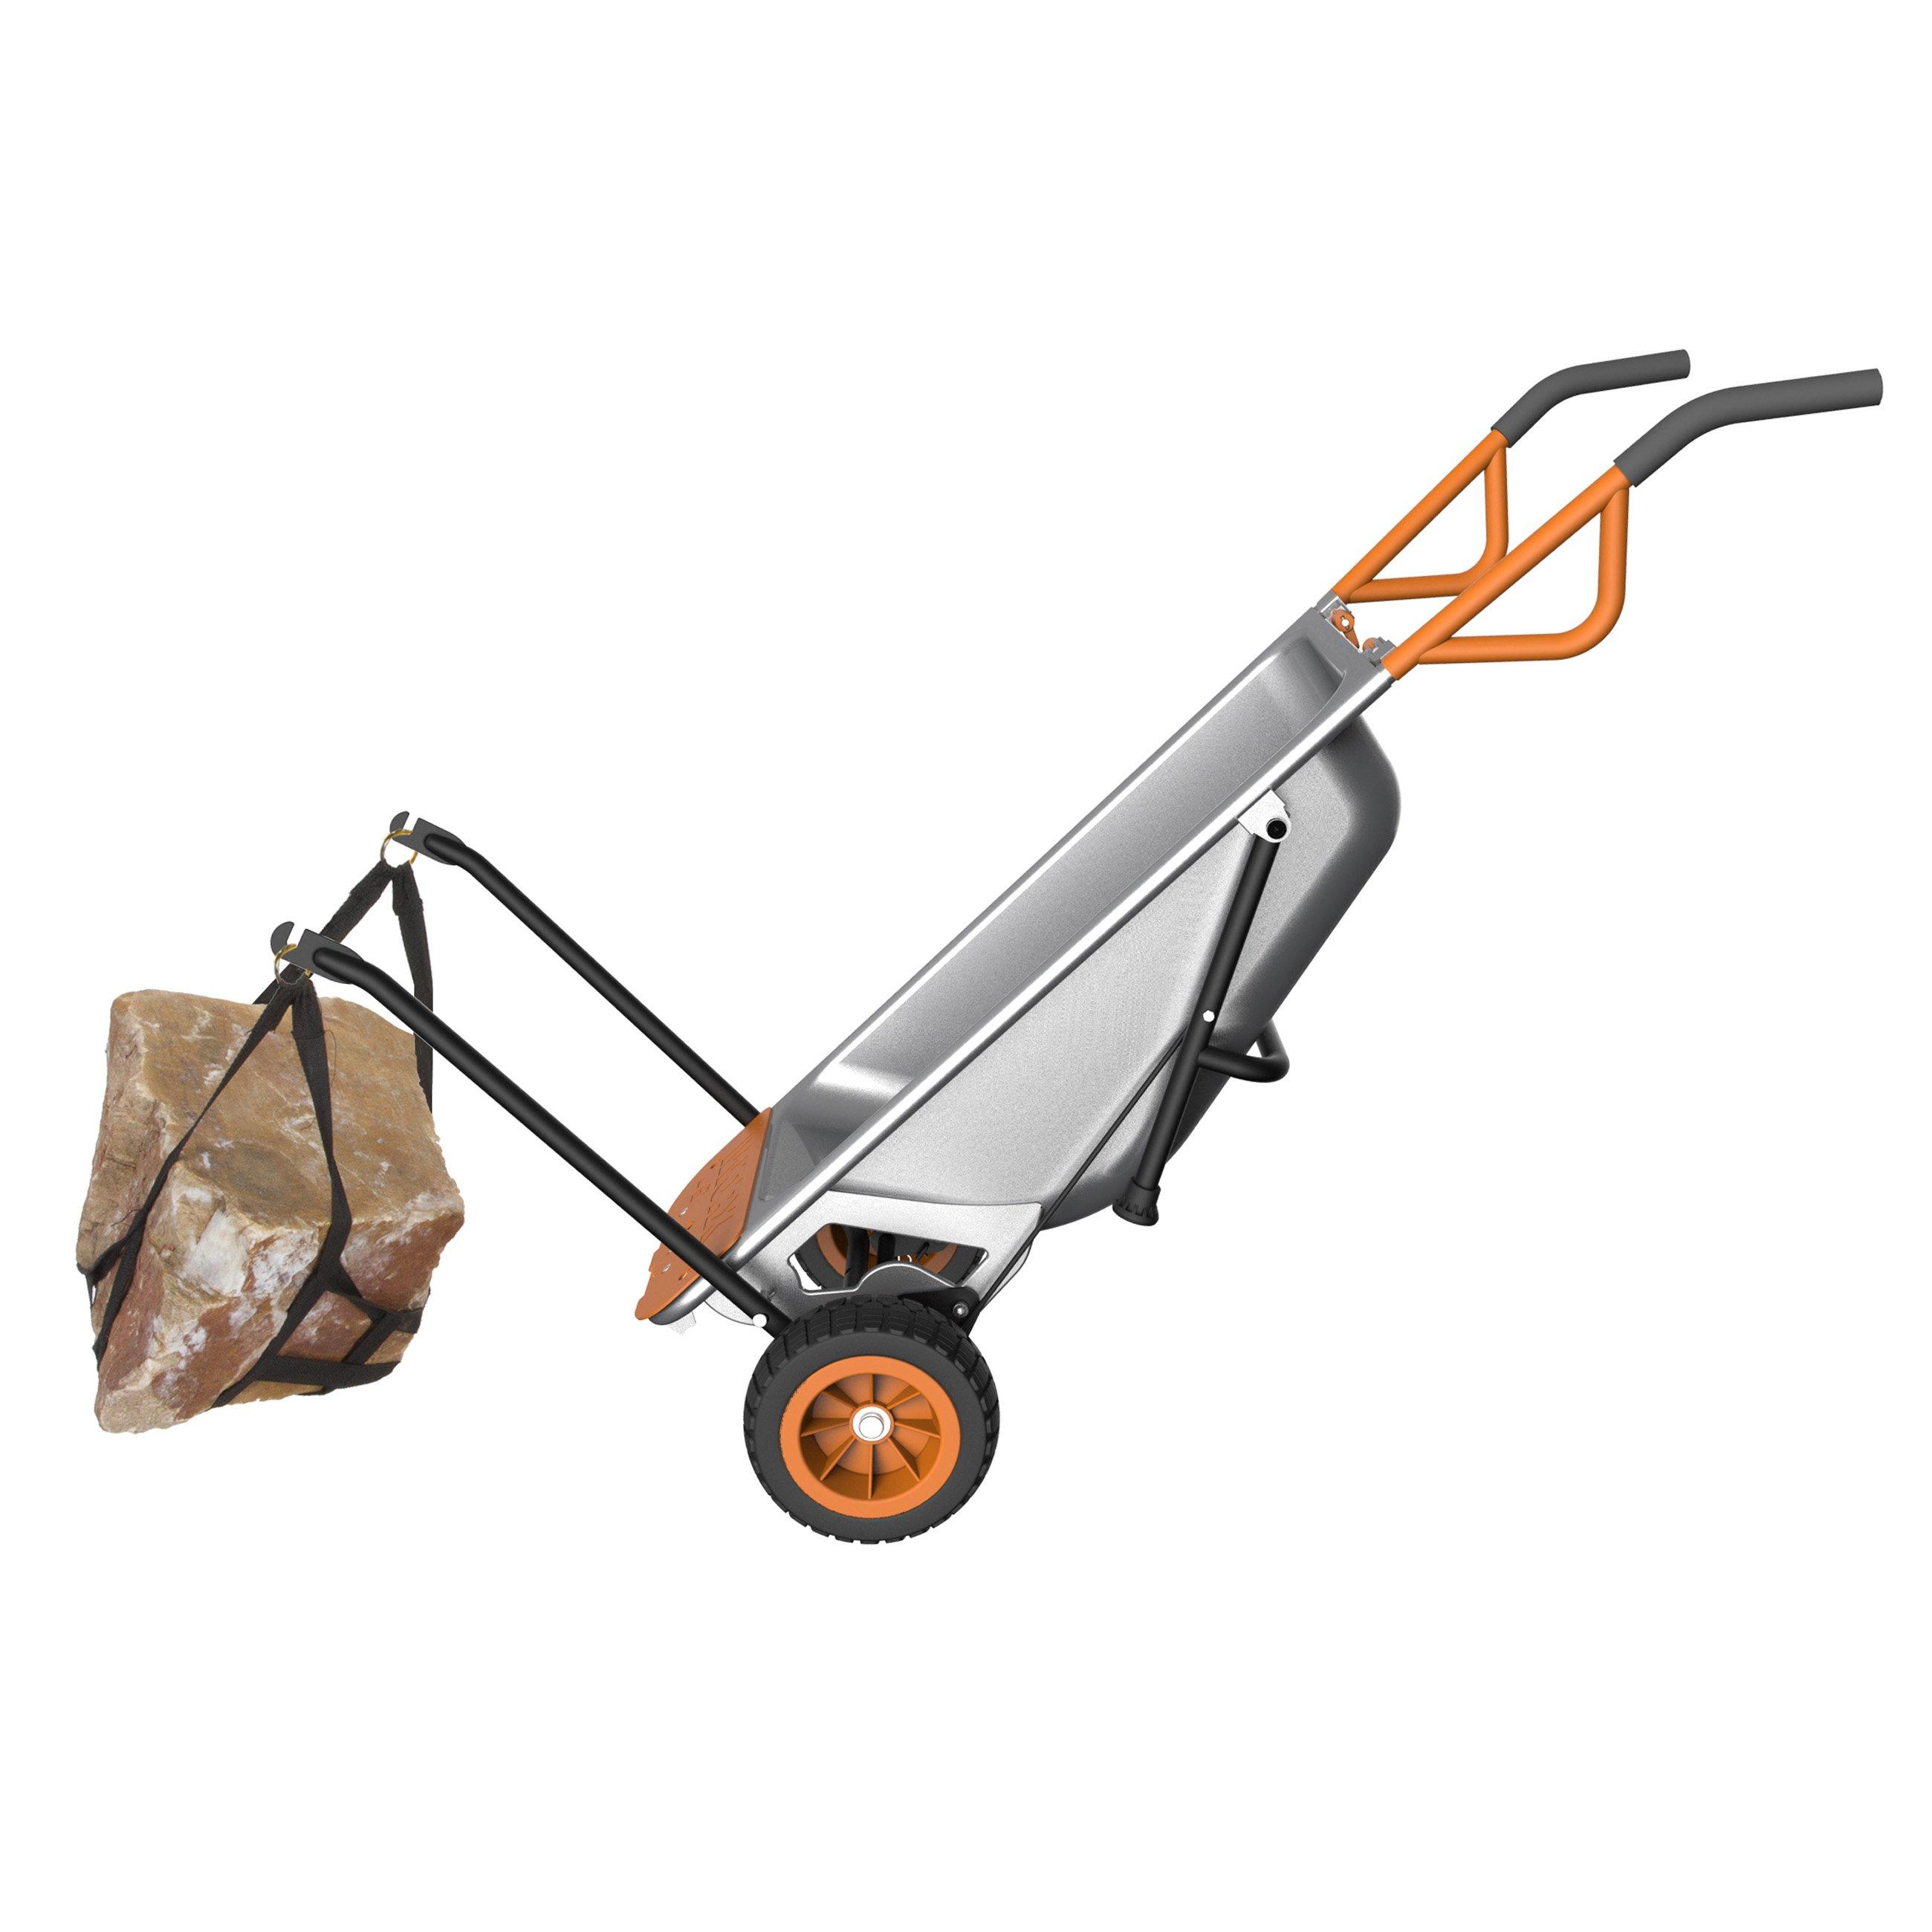 worx-wg050-aerocart-push-karre-كيس العربة